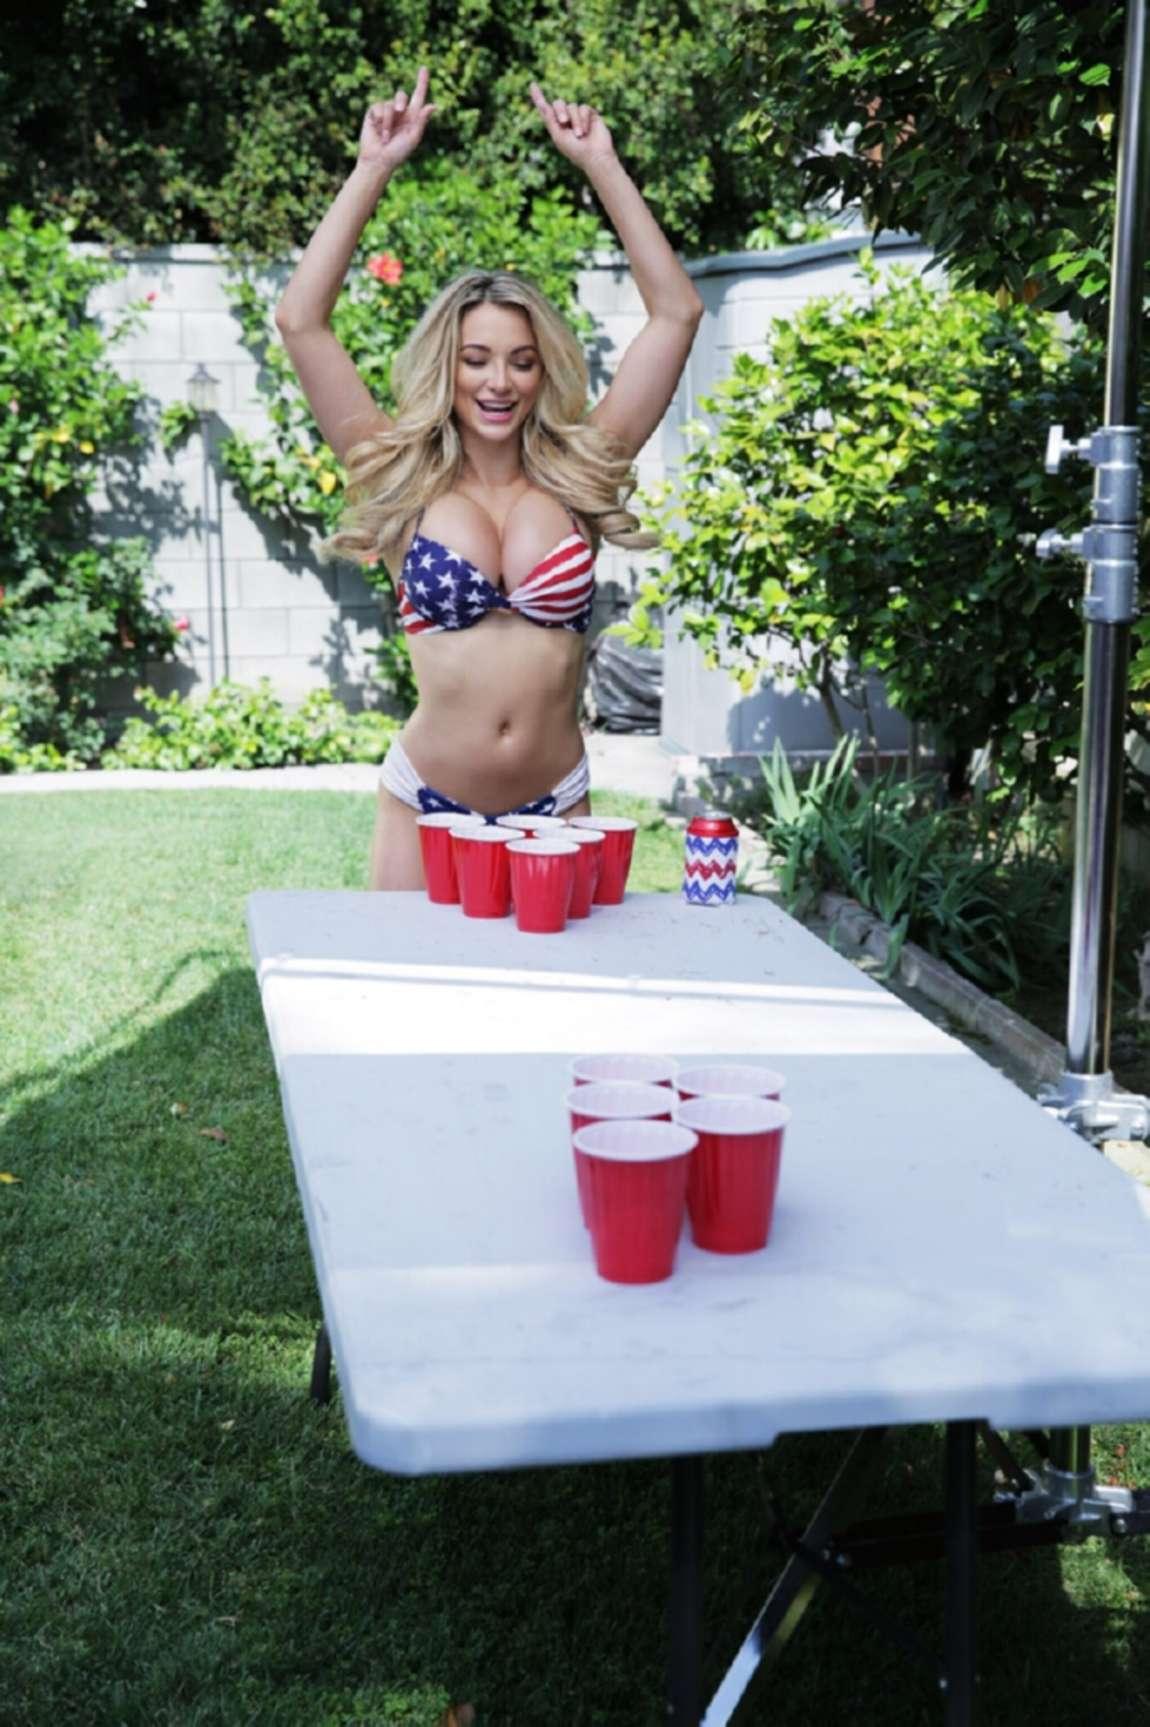 Lindsey Pelas Bikini Photoshoot